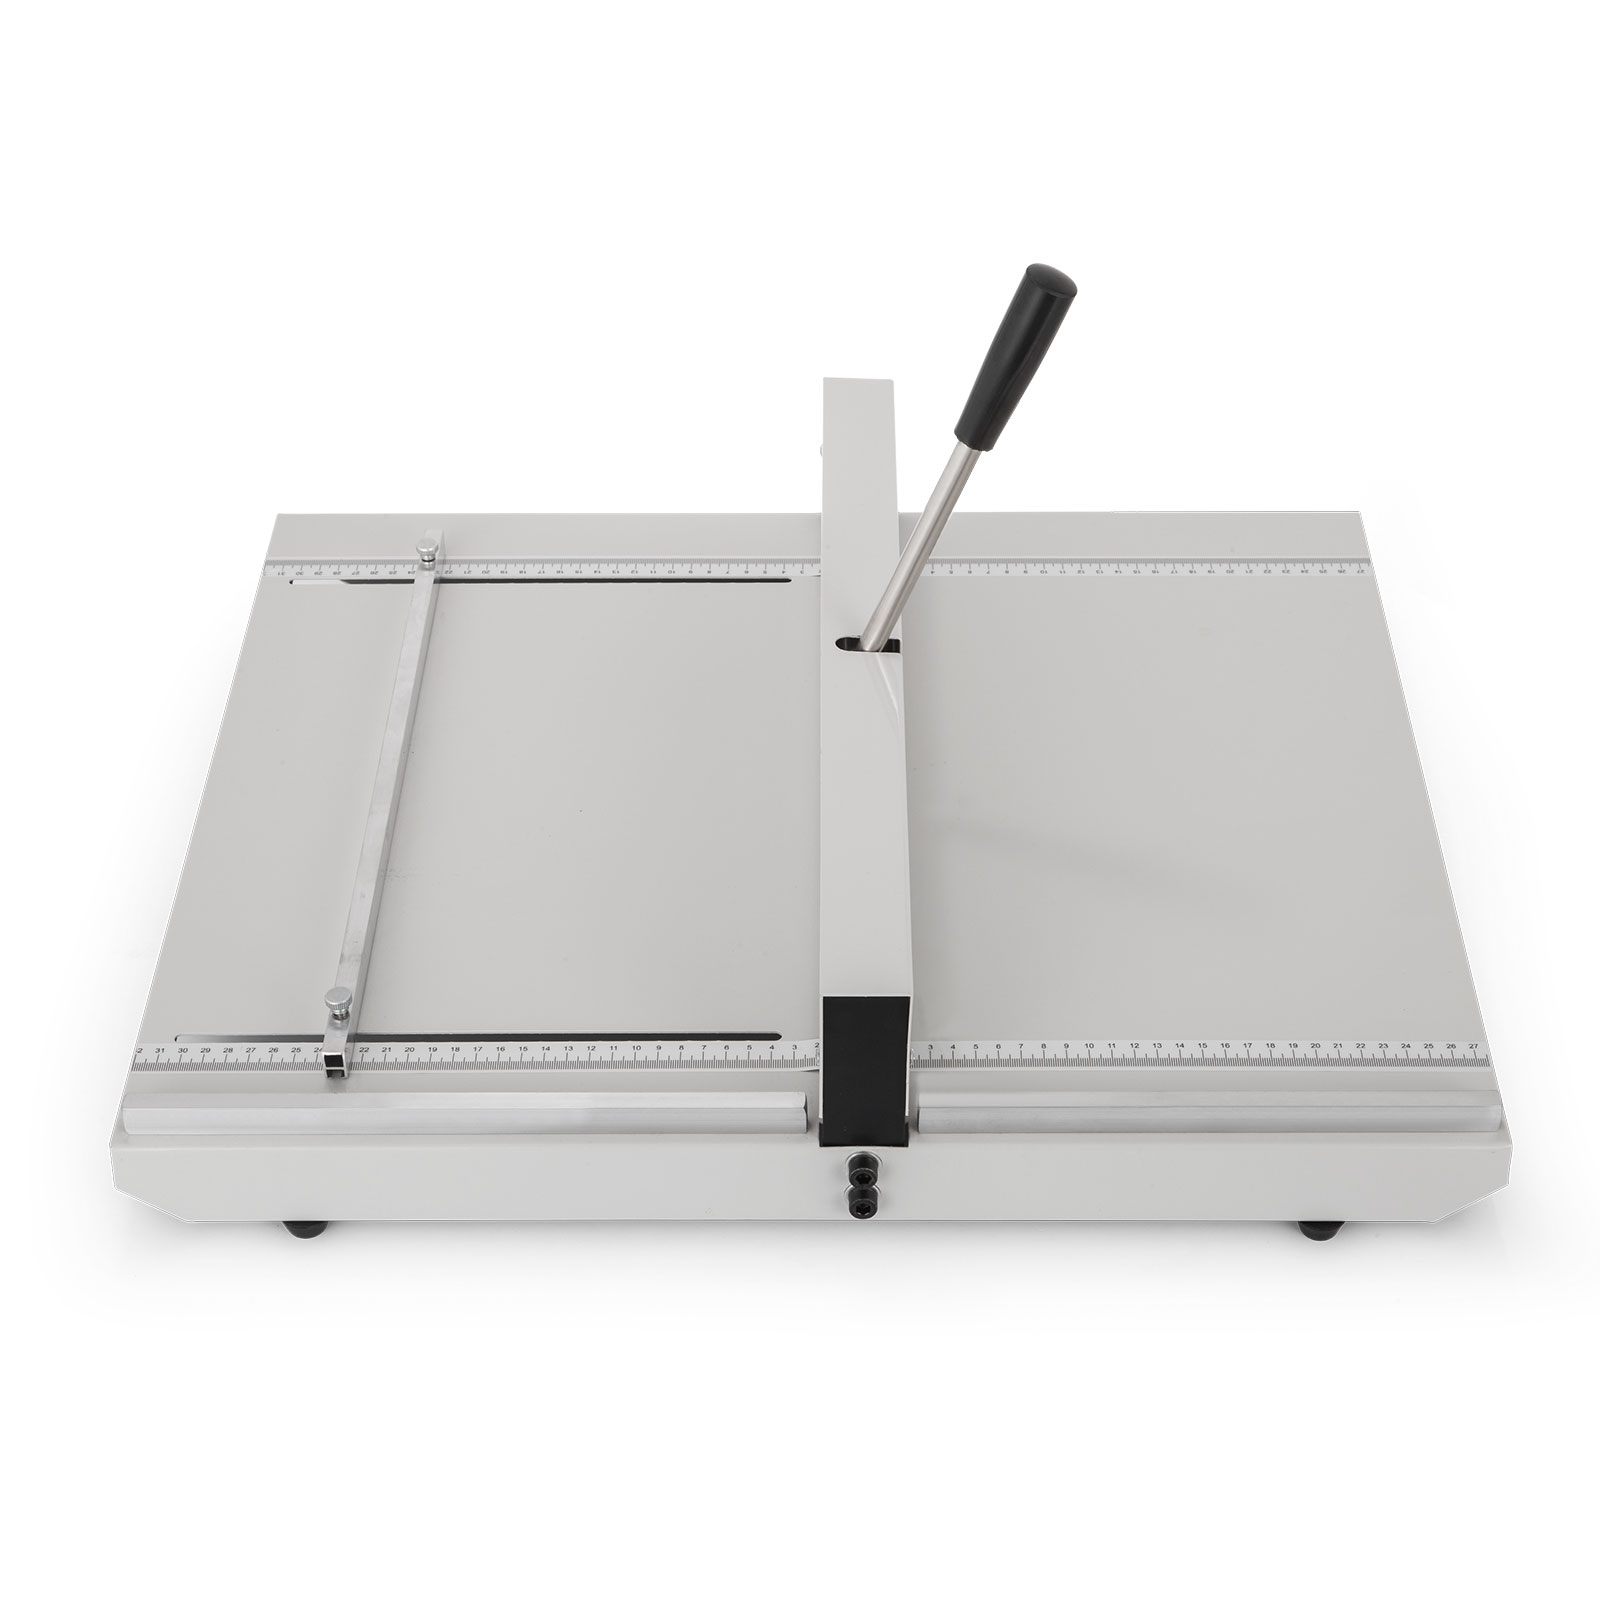 Cordonatrice-Perforatrice-Max-350-520mm-Profondita-Regolabile-Elettrica-Manuale miniatura 52